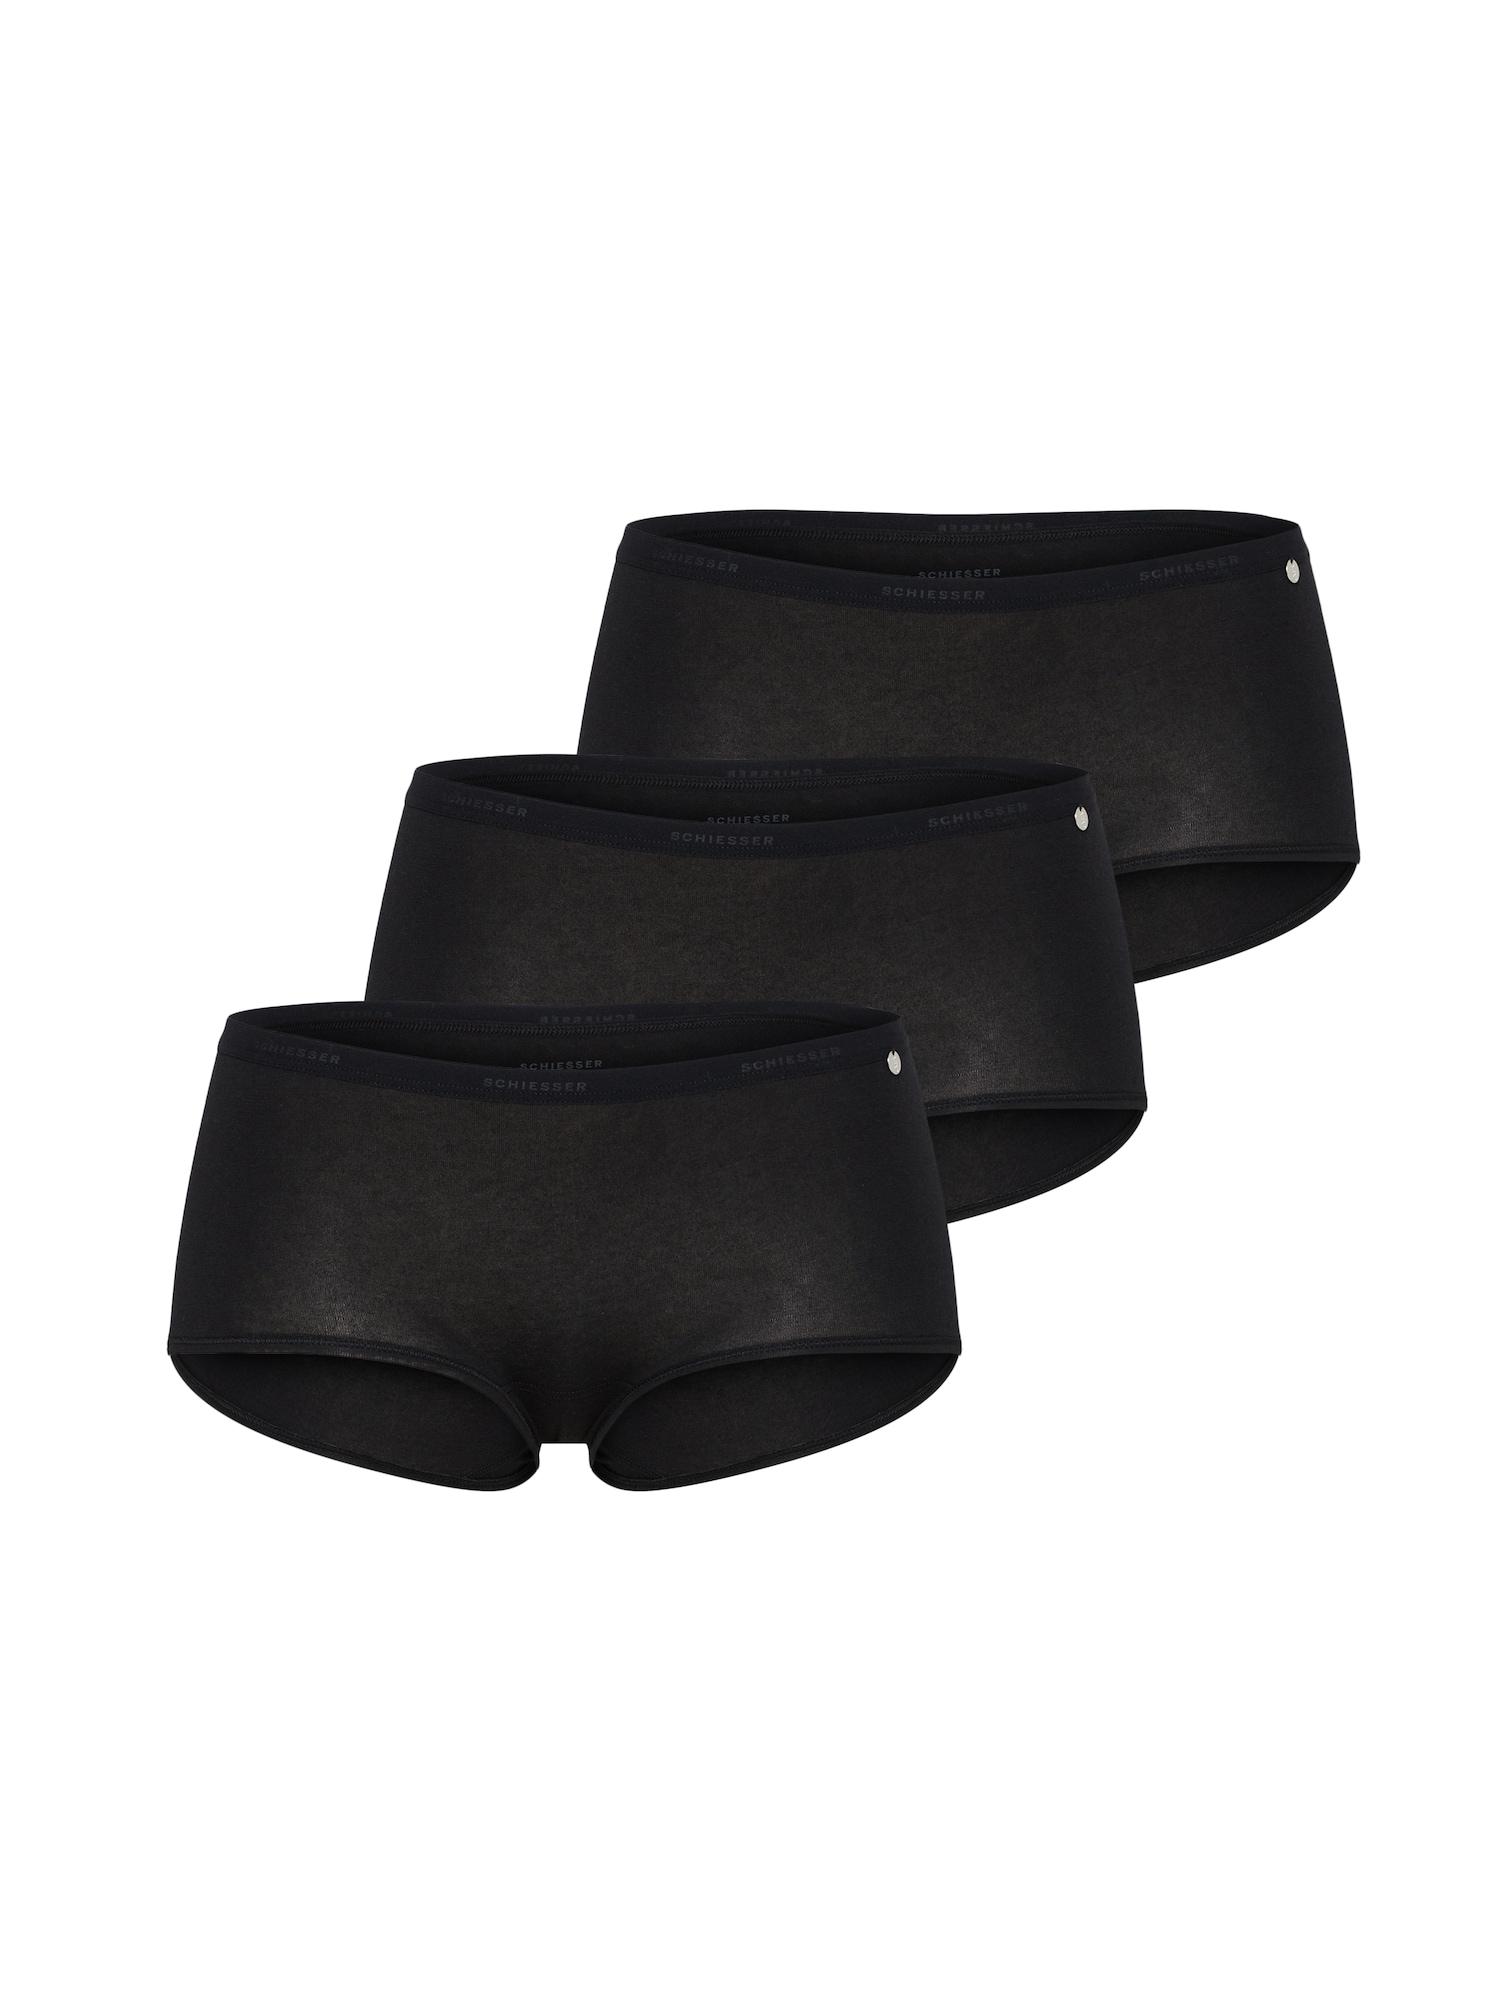 Kalhotky 3er Pack černá SCHIESSER